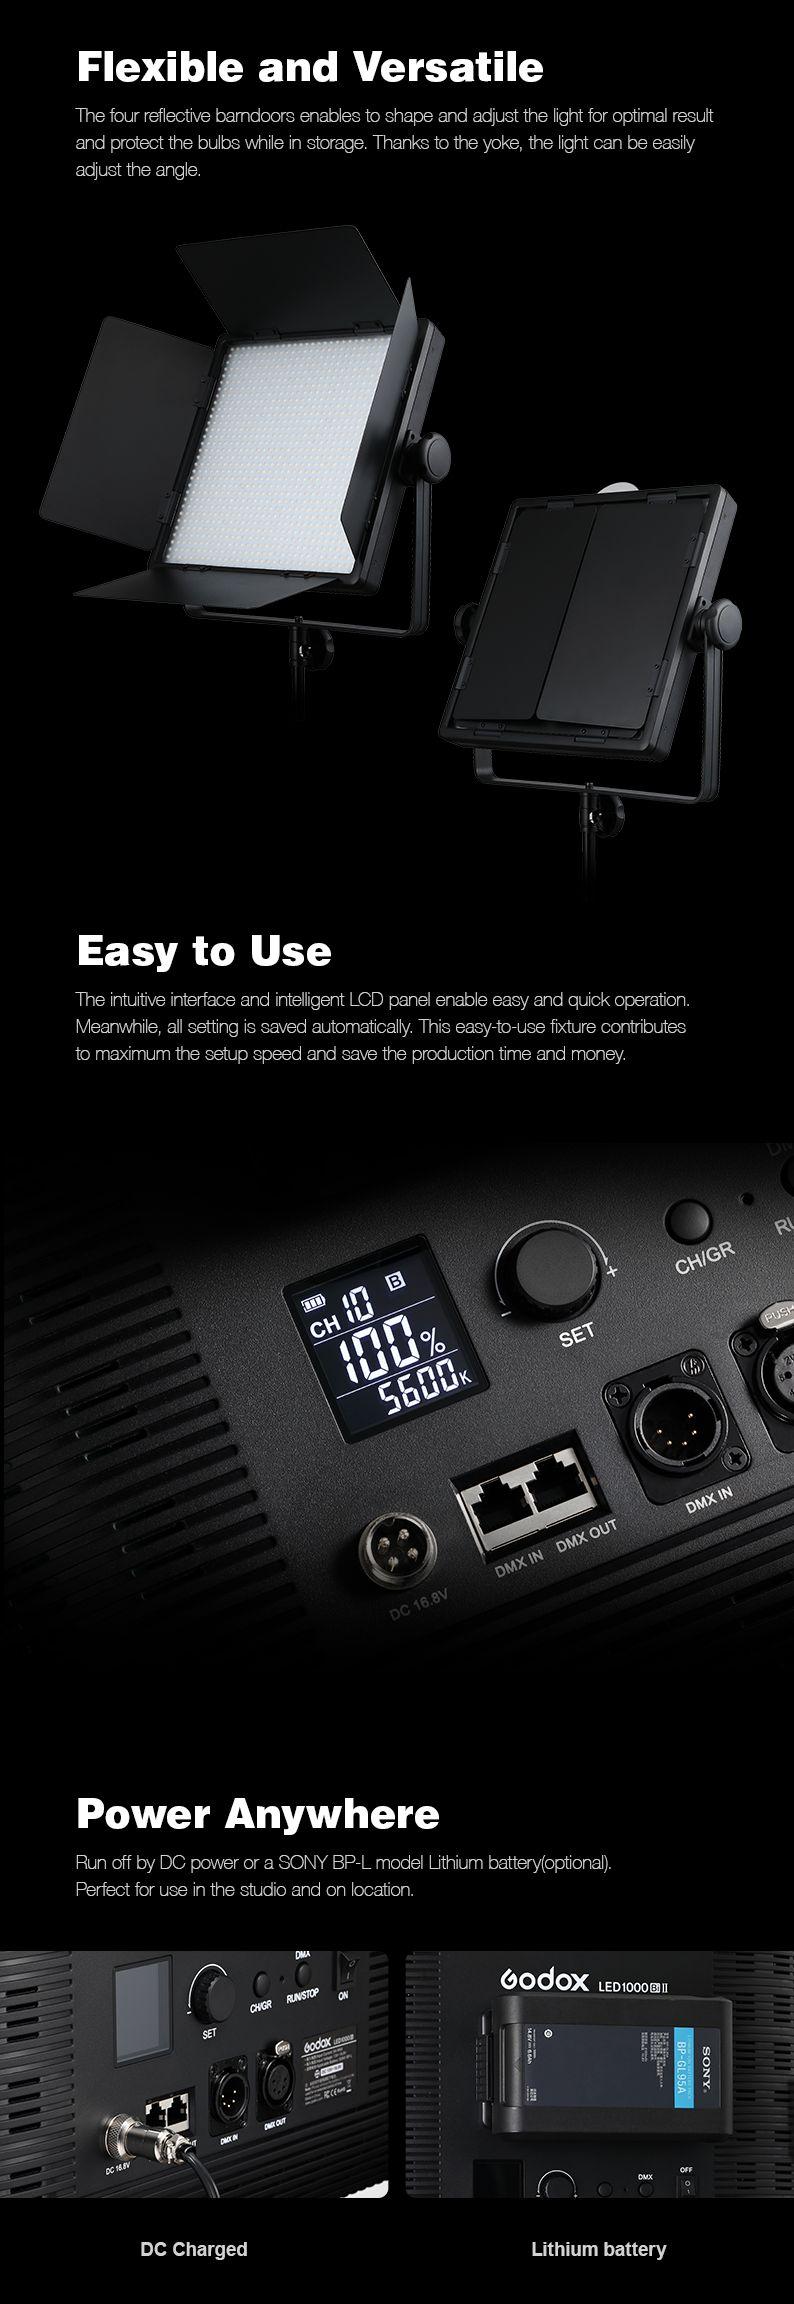 Godox LED1000 II Flexible and Versatile. Easy to Use. Power Anywhere.